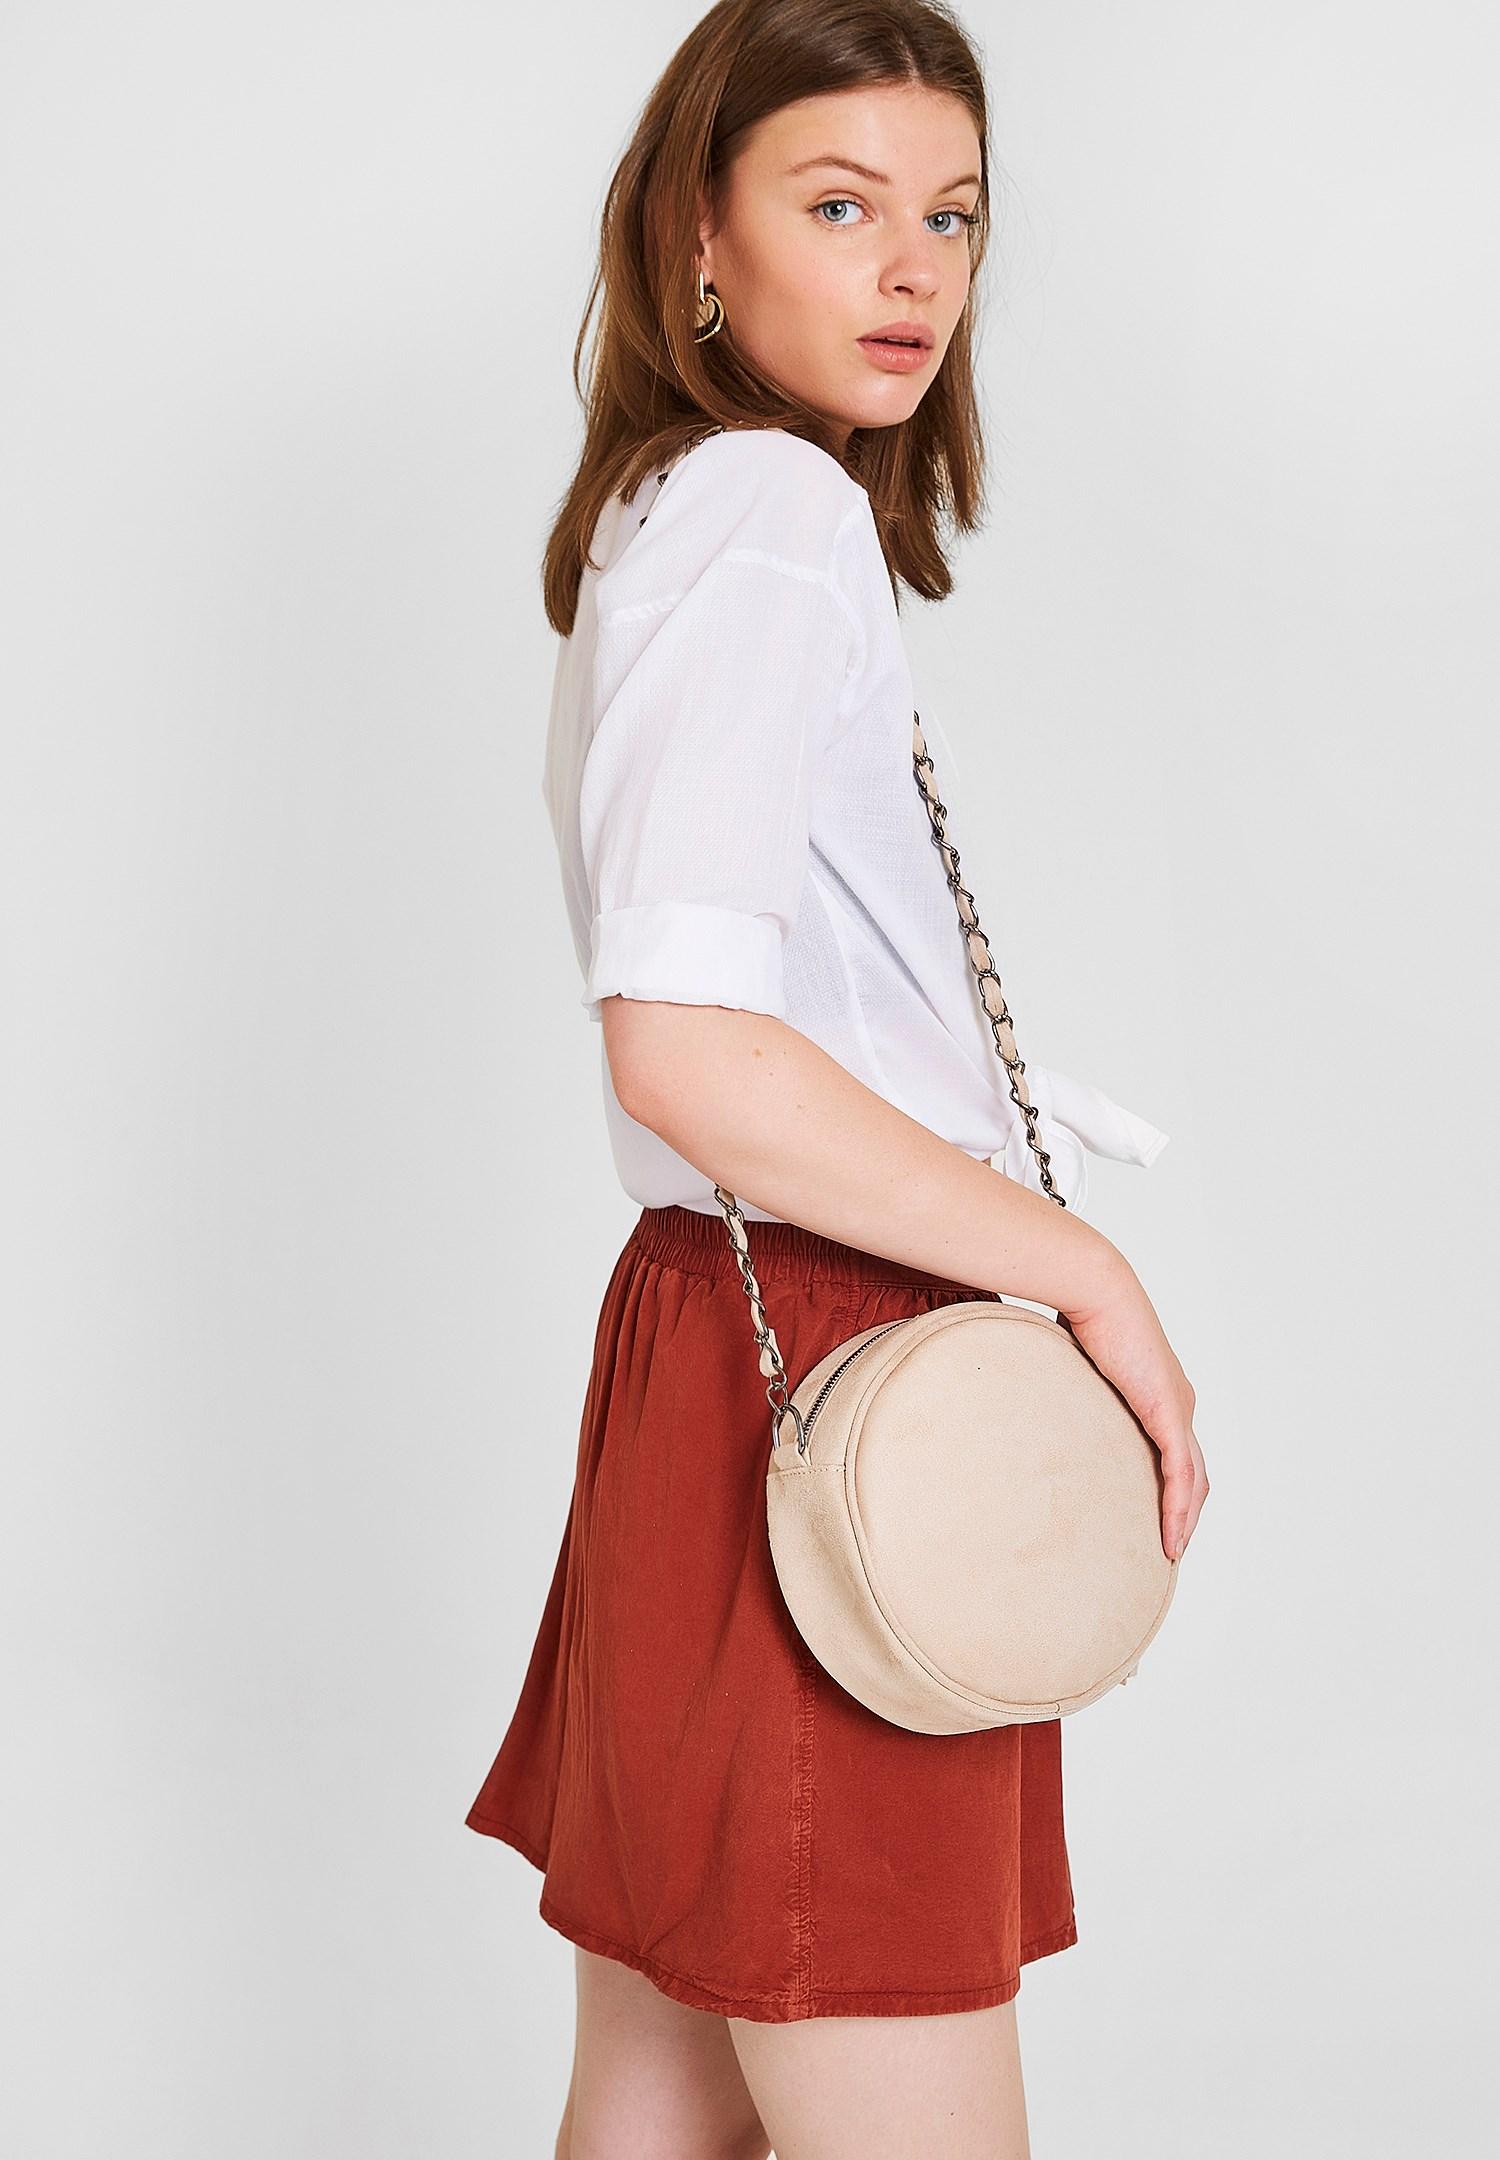 Bayan Gri Yuvarlak Formlu Askılı Çanta